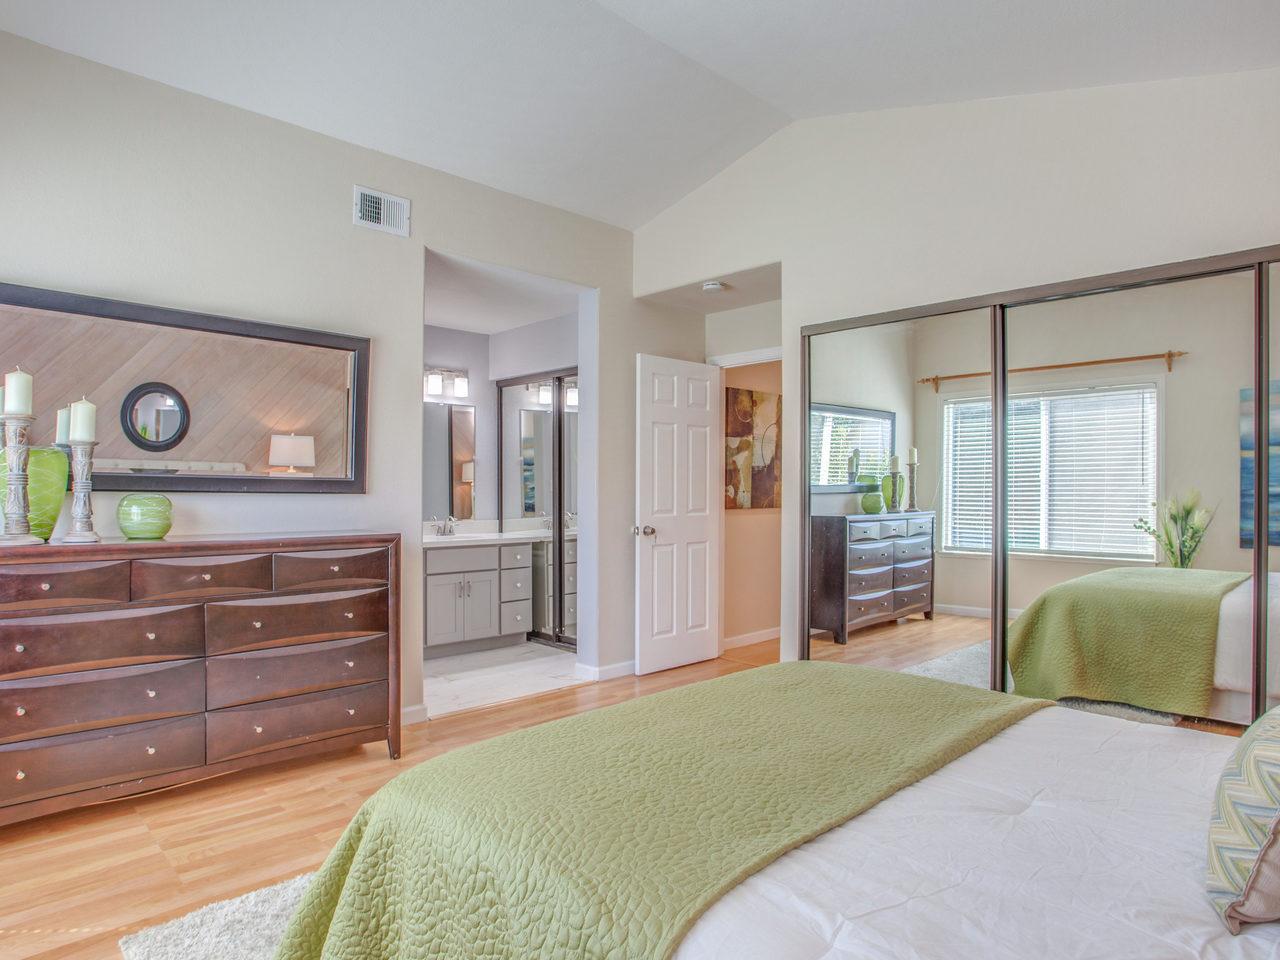 4620 Kelso St Union City CA-MLS_Size-017-18-Master Bedroom-1280x960-72dpi.jpg